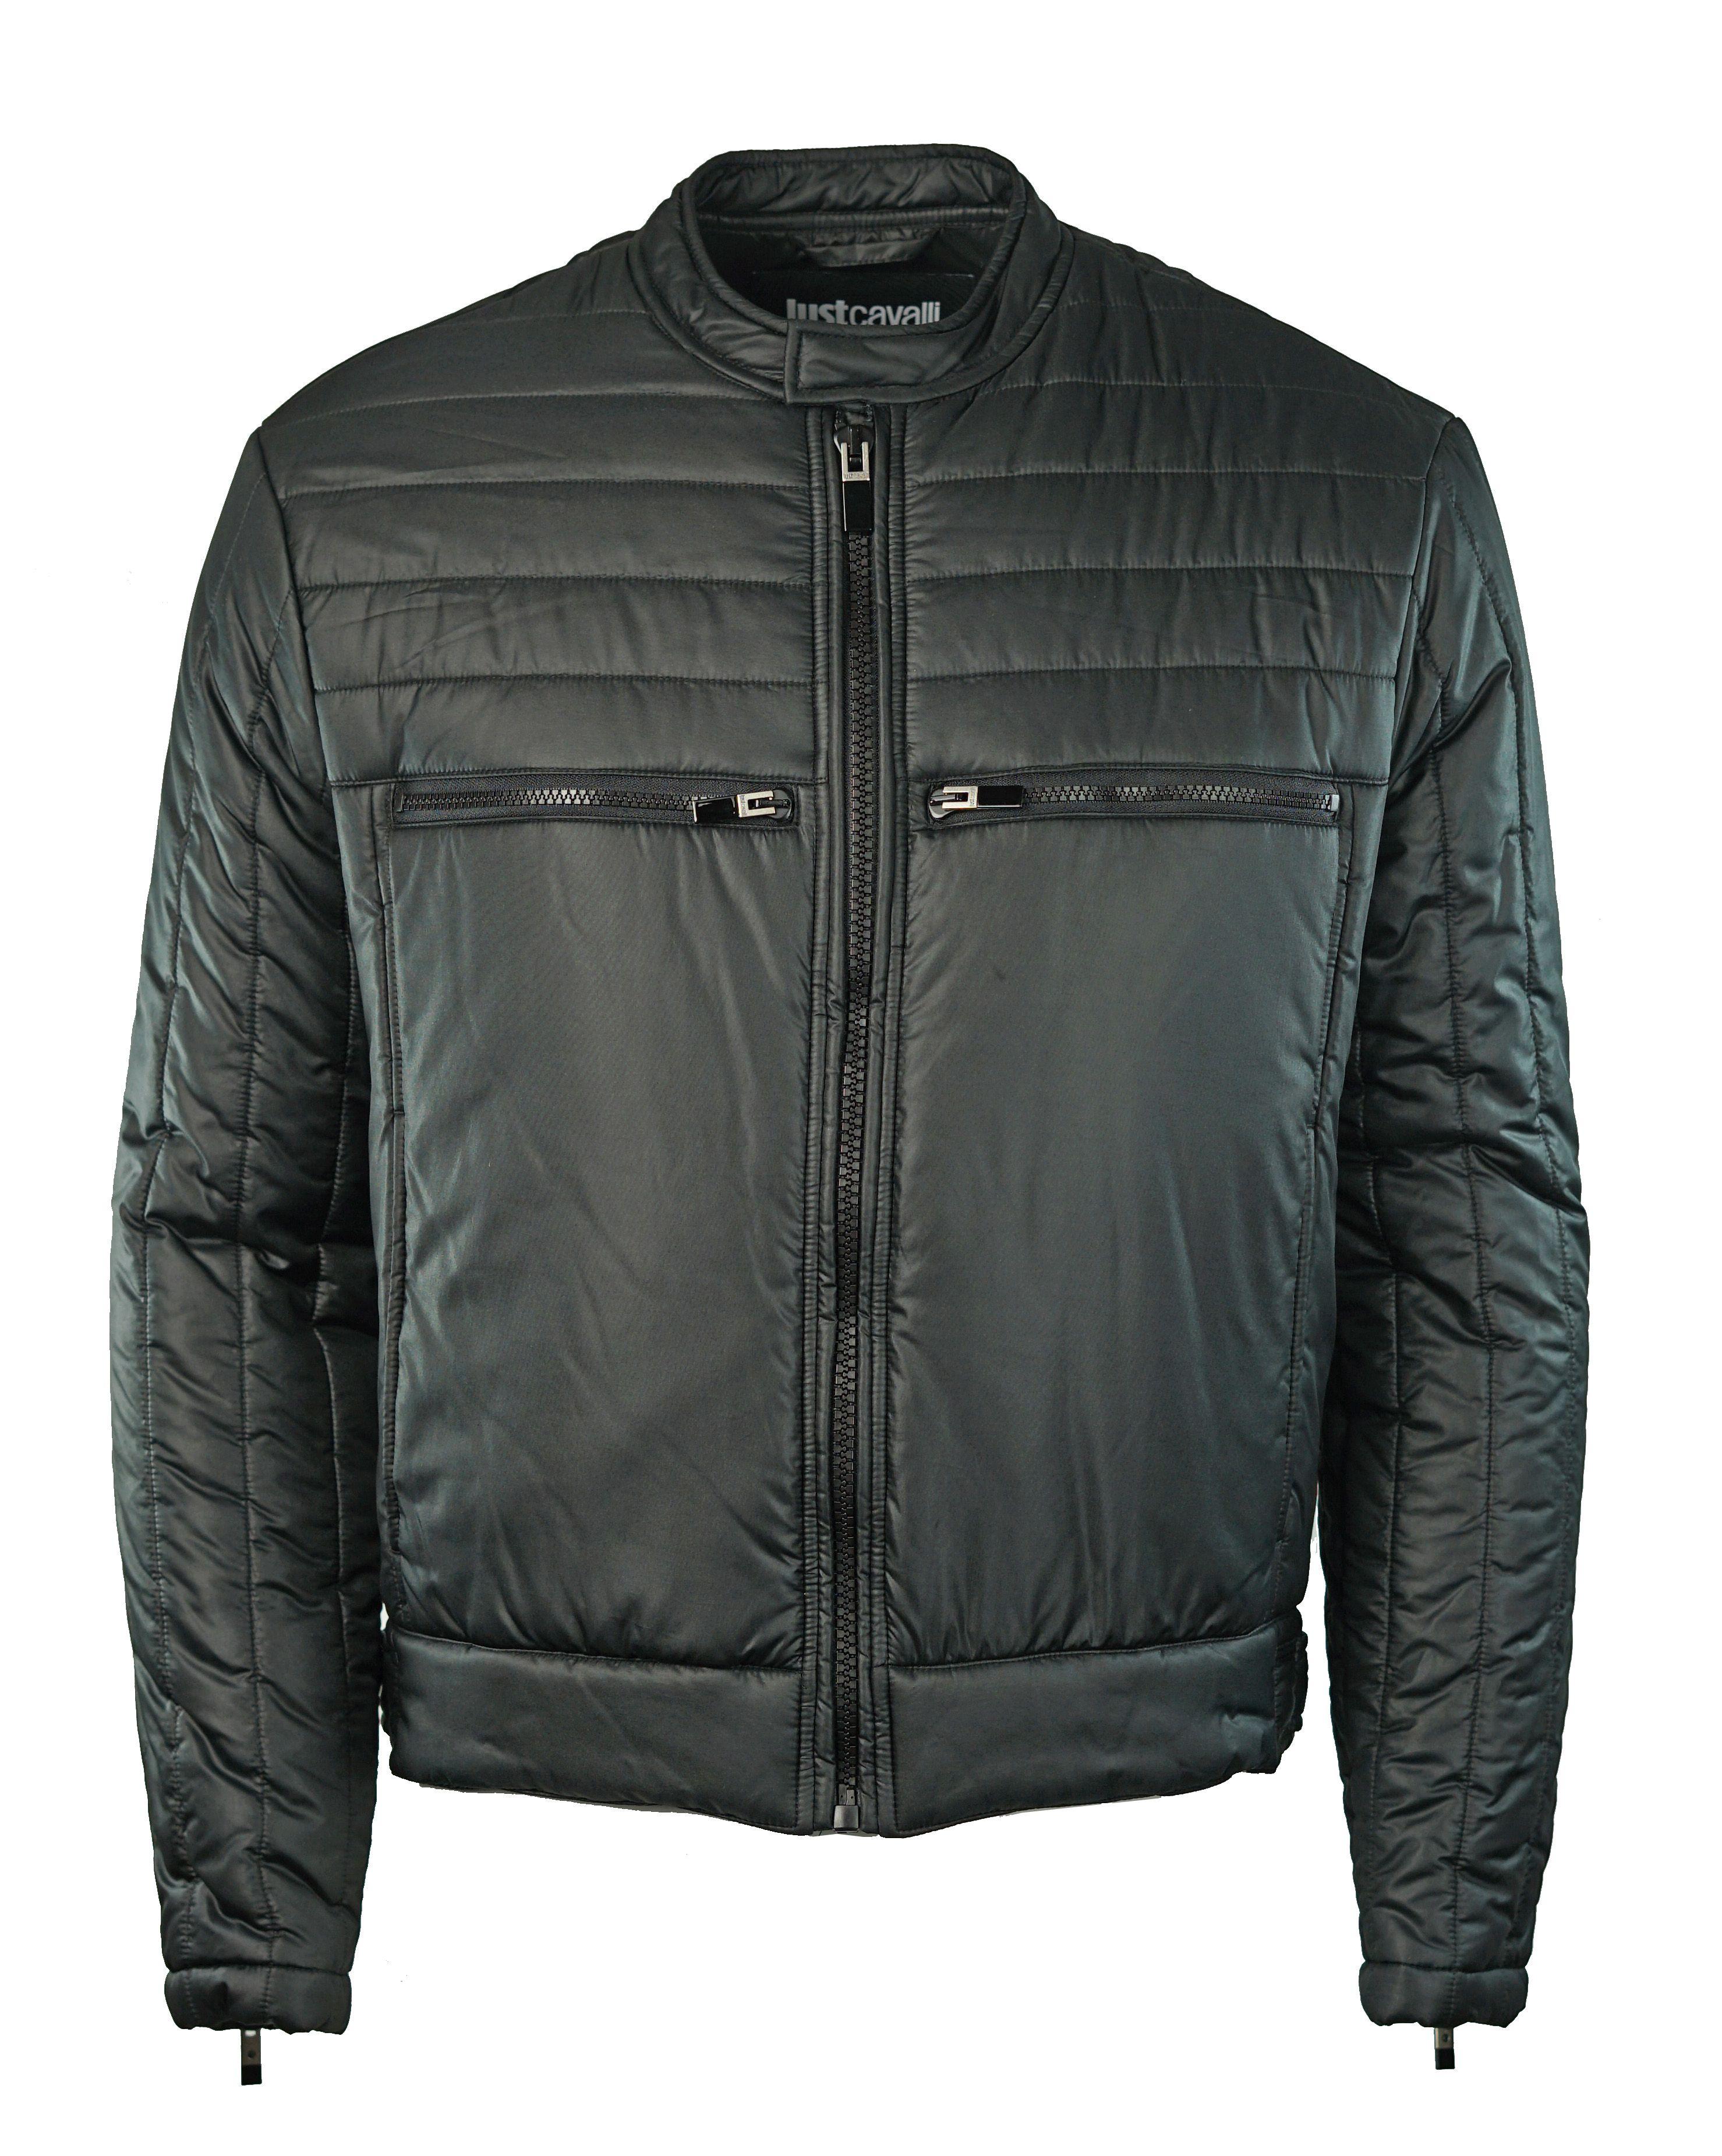 Just Cavalli S03AM0286 N29278 900 Jacket